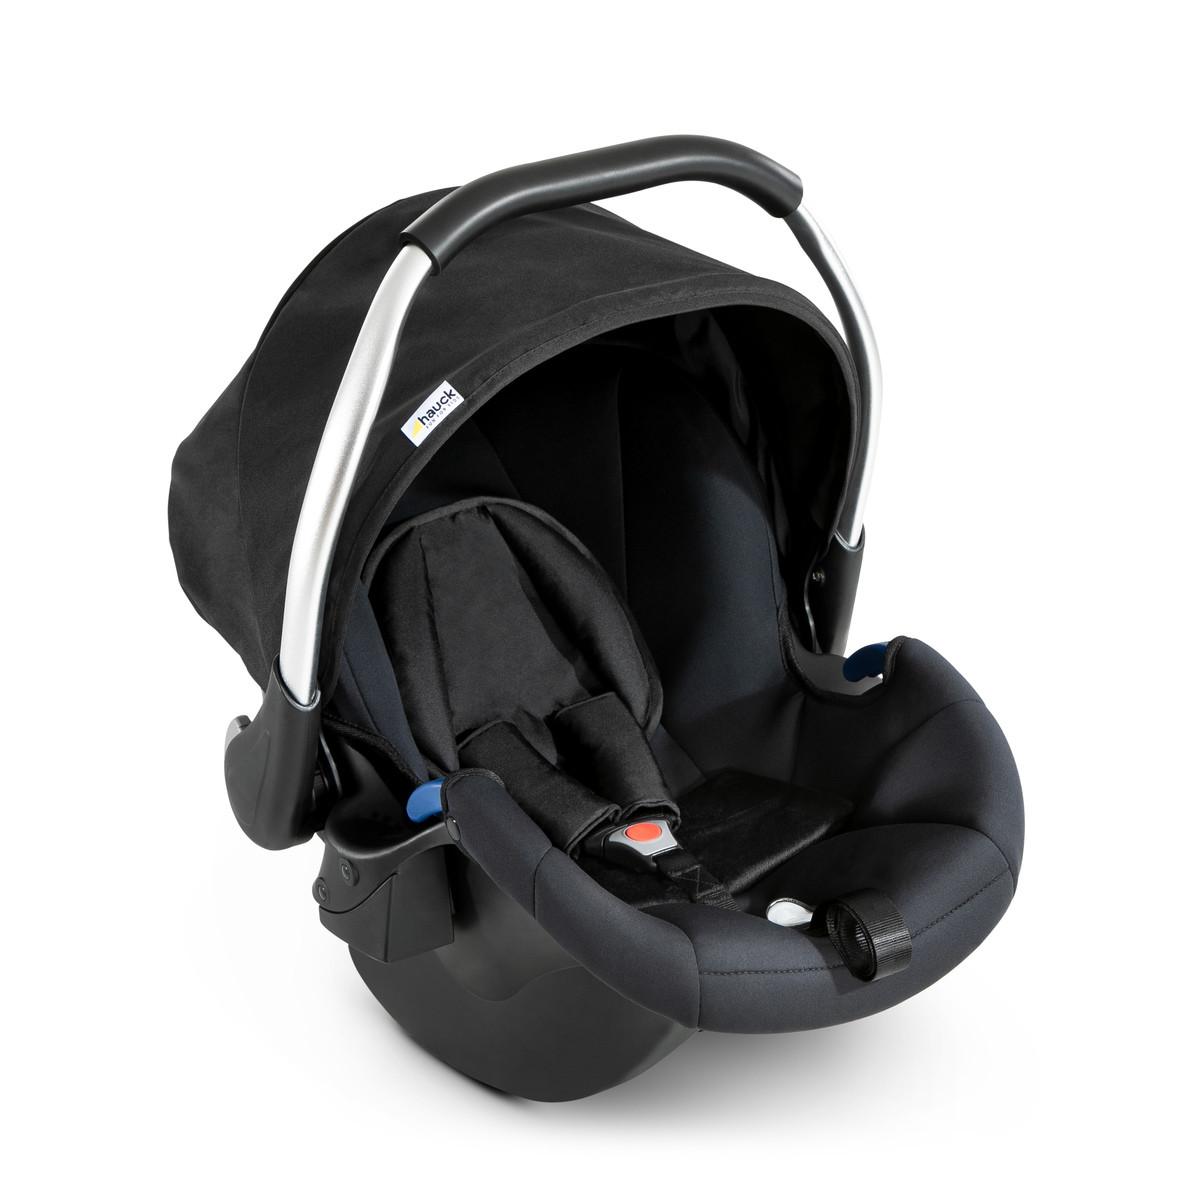 copy of Seggiolino Ipro Baby I-Size Hauck